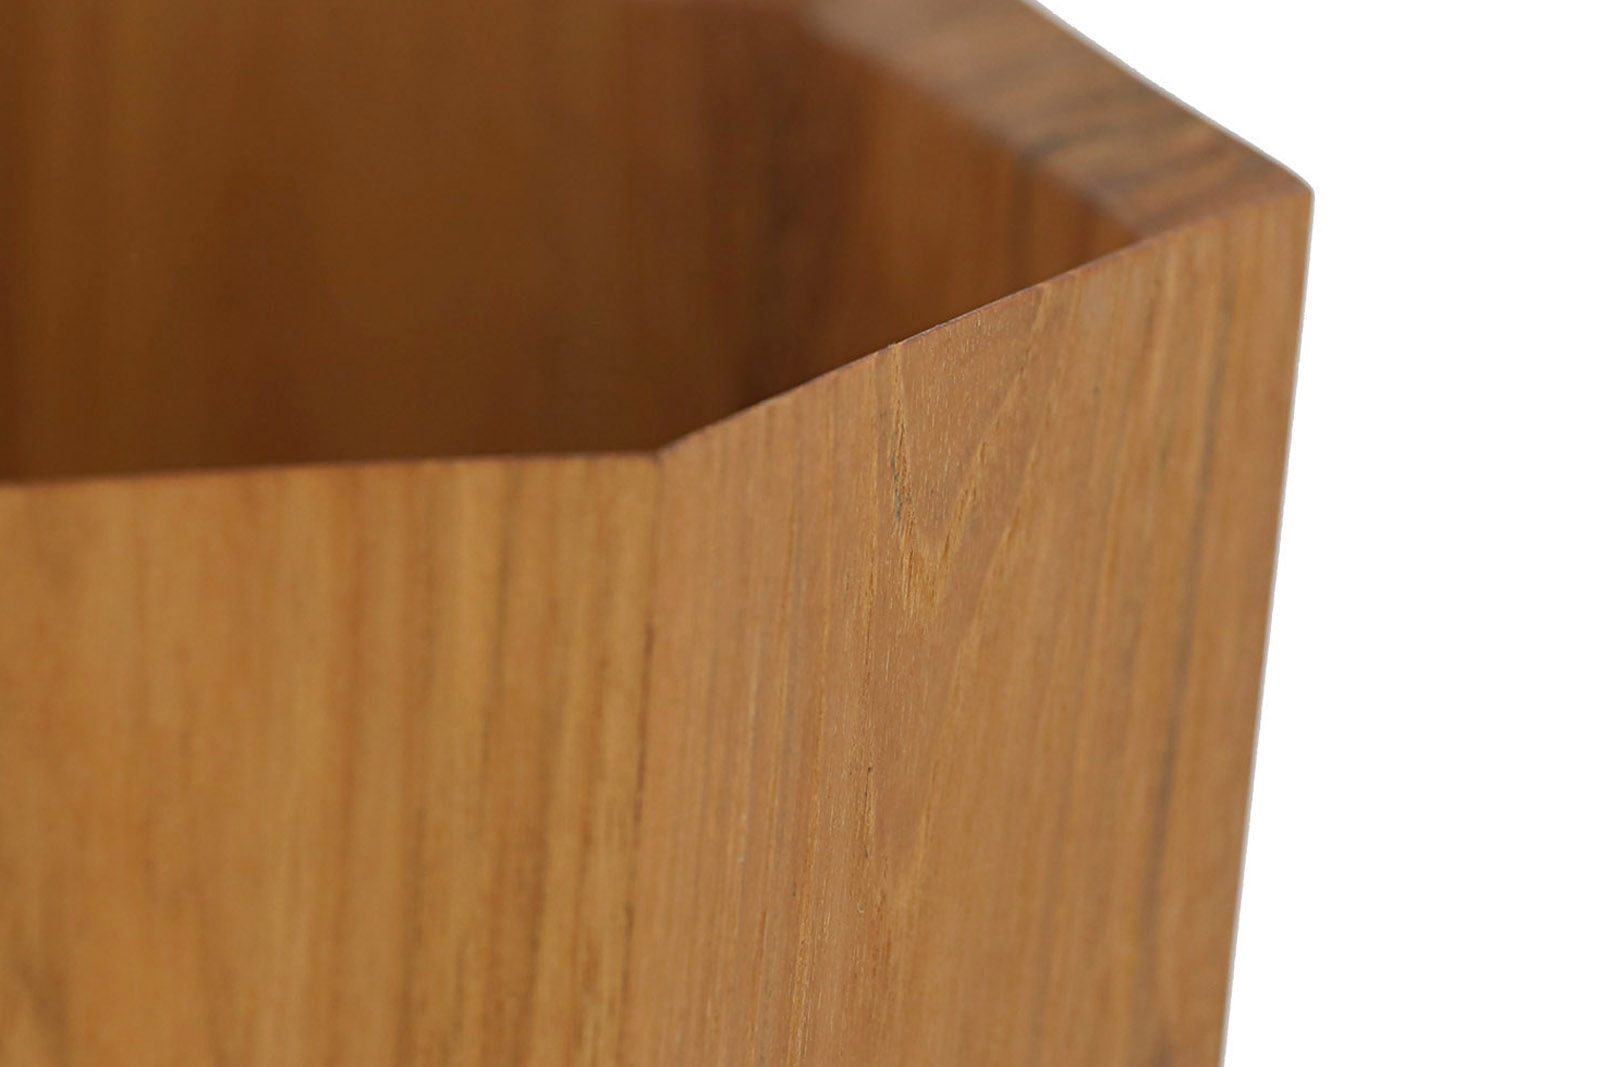 CHLOROS(クロロス) チーク無垢材を使用した八角形のダストボックス/ゴミ箱